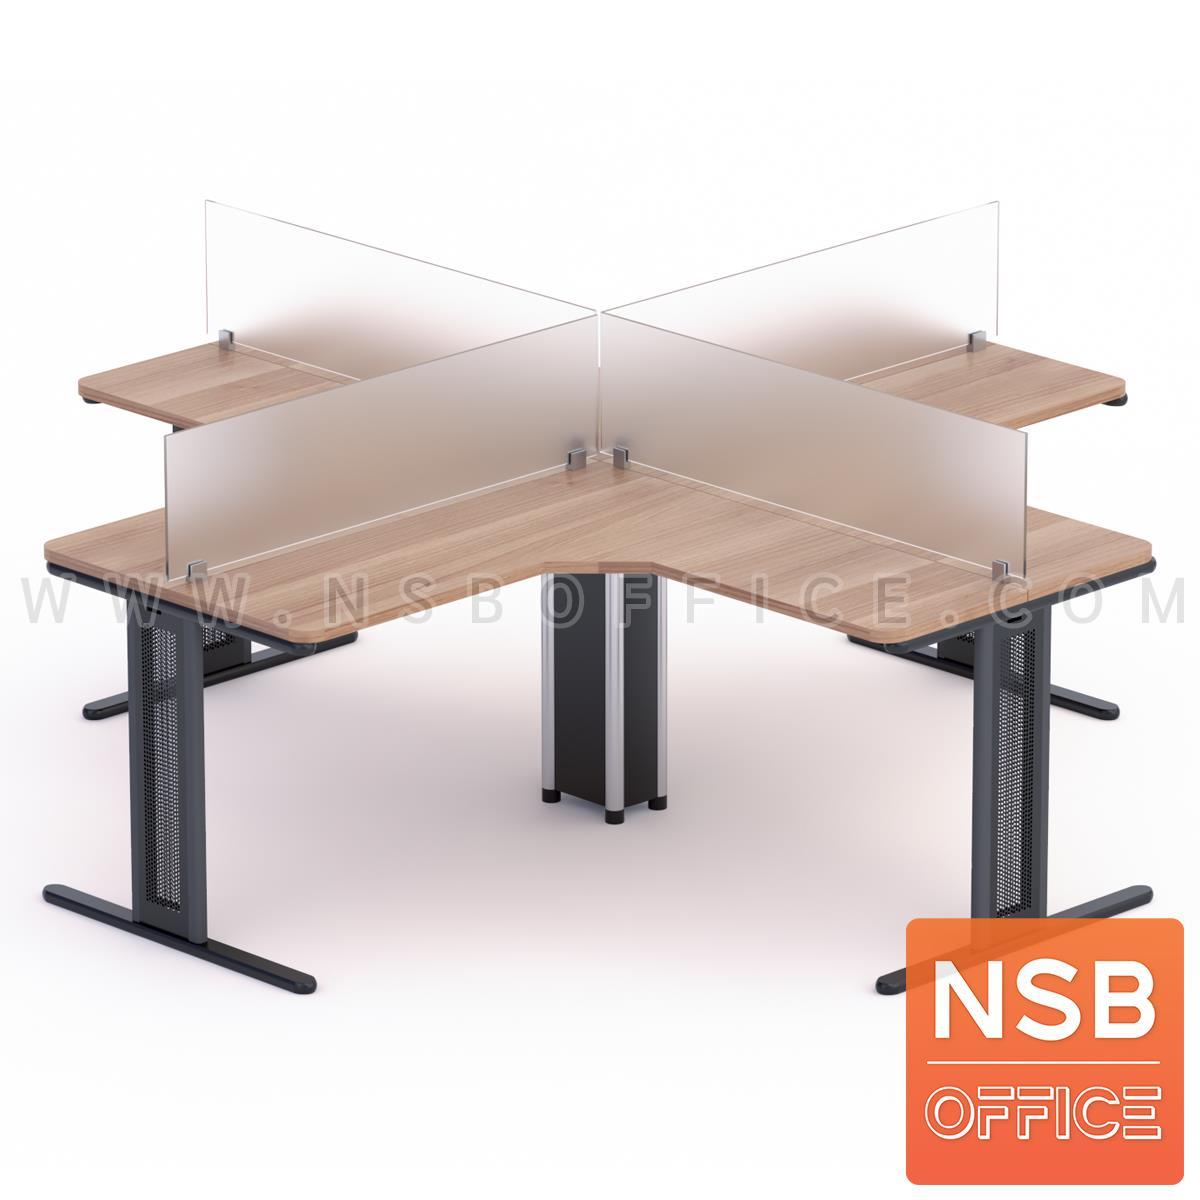 A27A006:ชุดโต๊ะทำงานกลุ่ม 4 ที่นั่ง  รุ่น TY-WS014G  ขนาด 240W cm. พร้อมมินิสกรีนกระจก